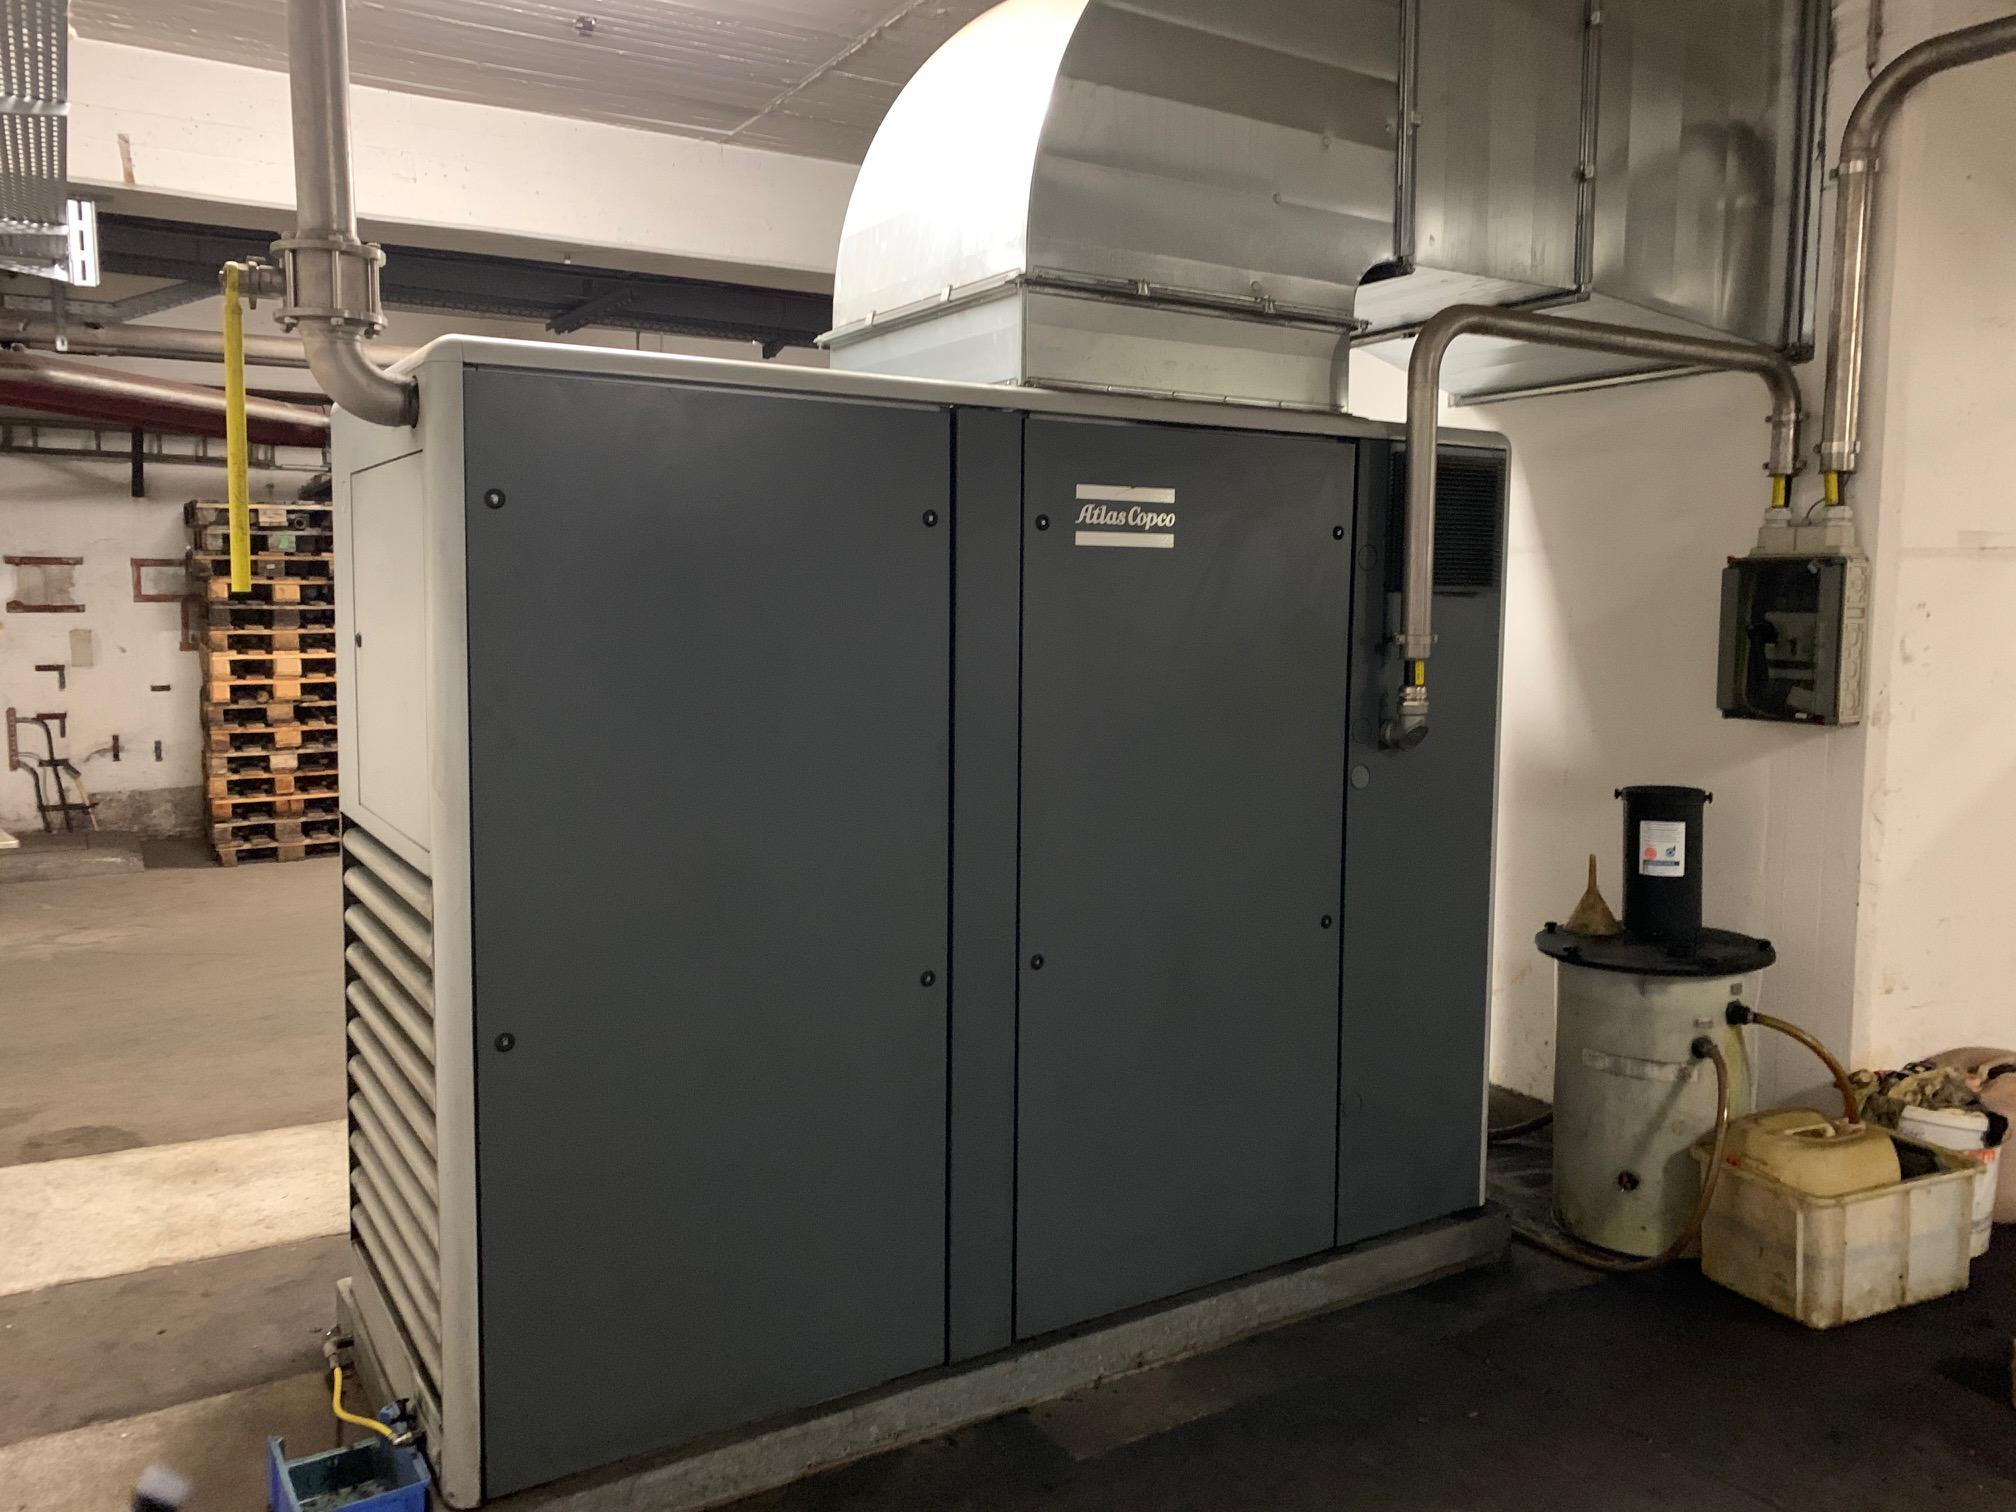 Lot 349 - Atlas Copco GA 90VSD air compressor. Serial number